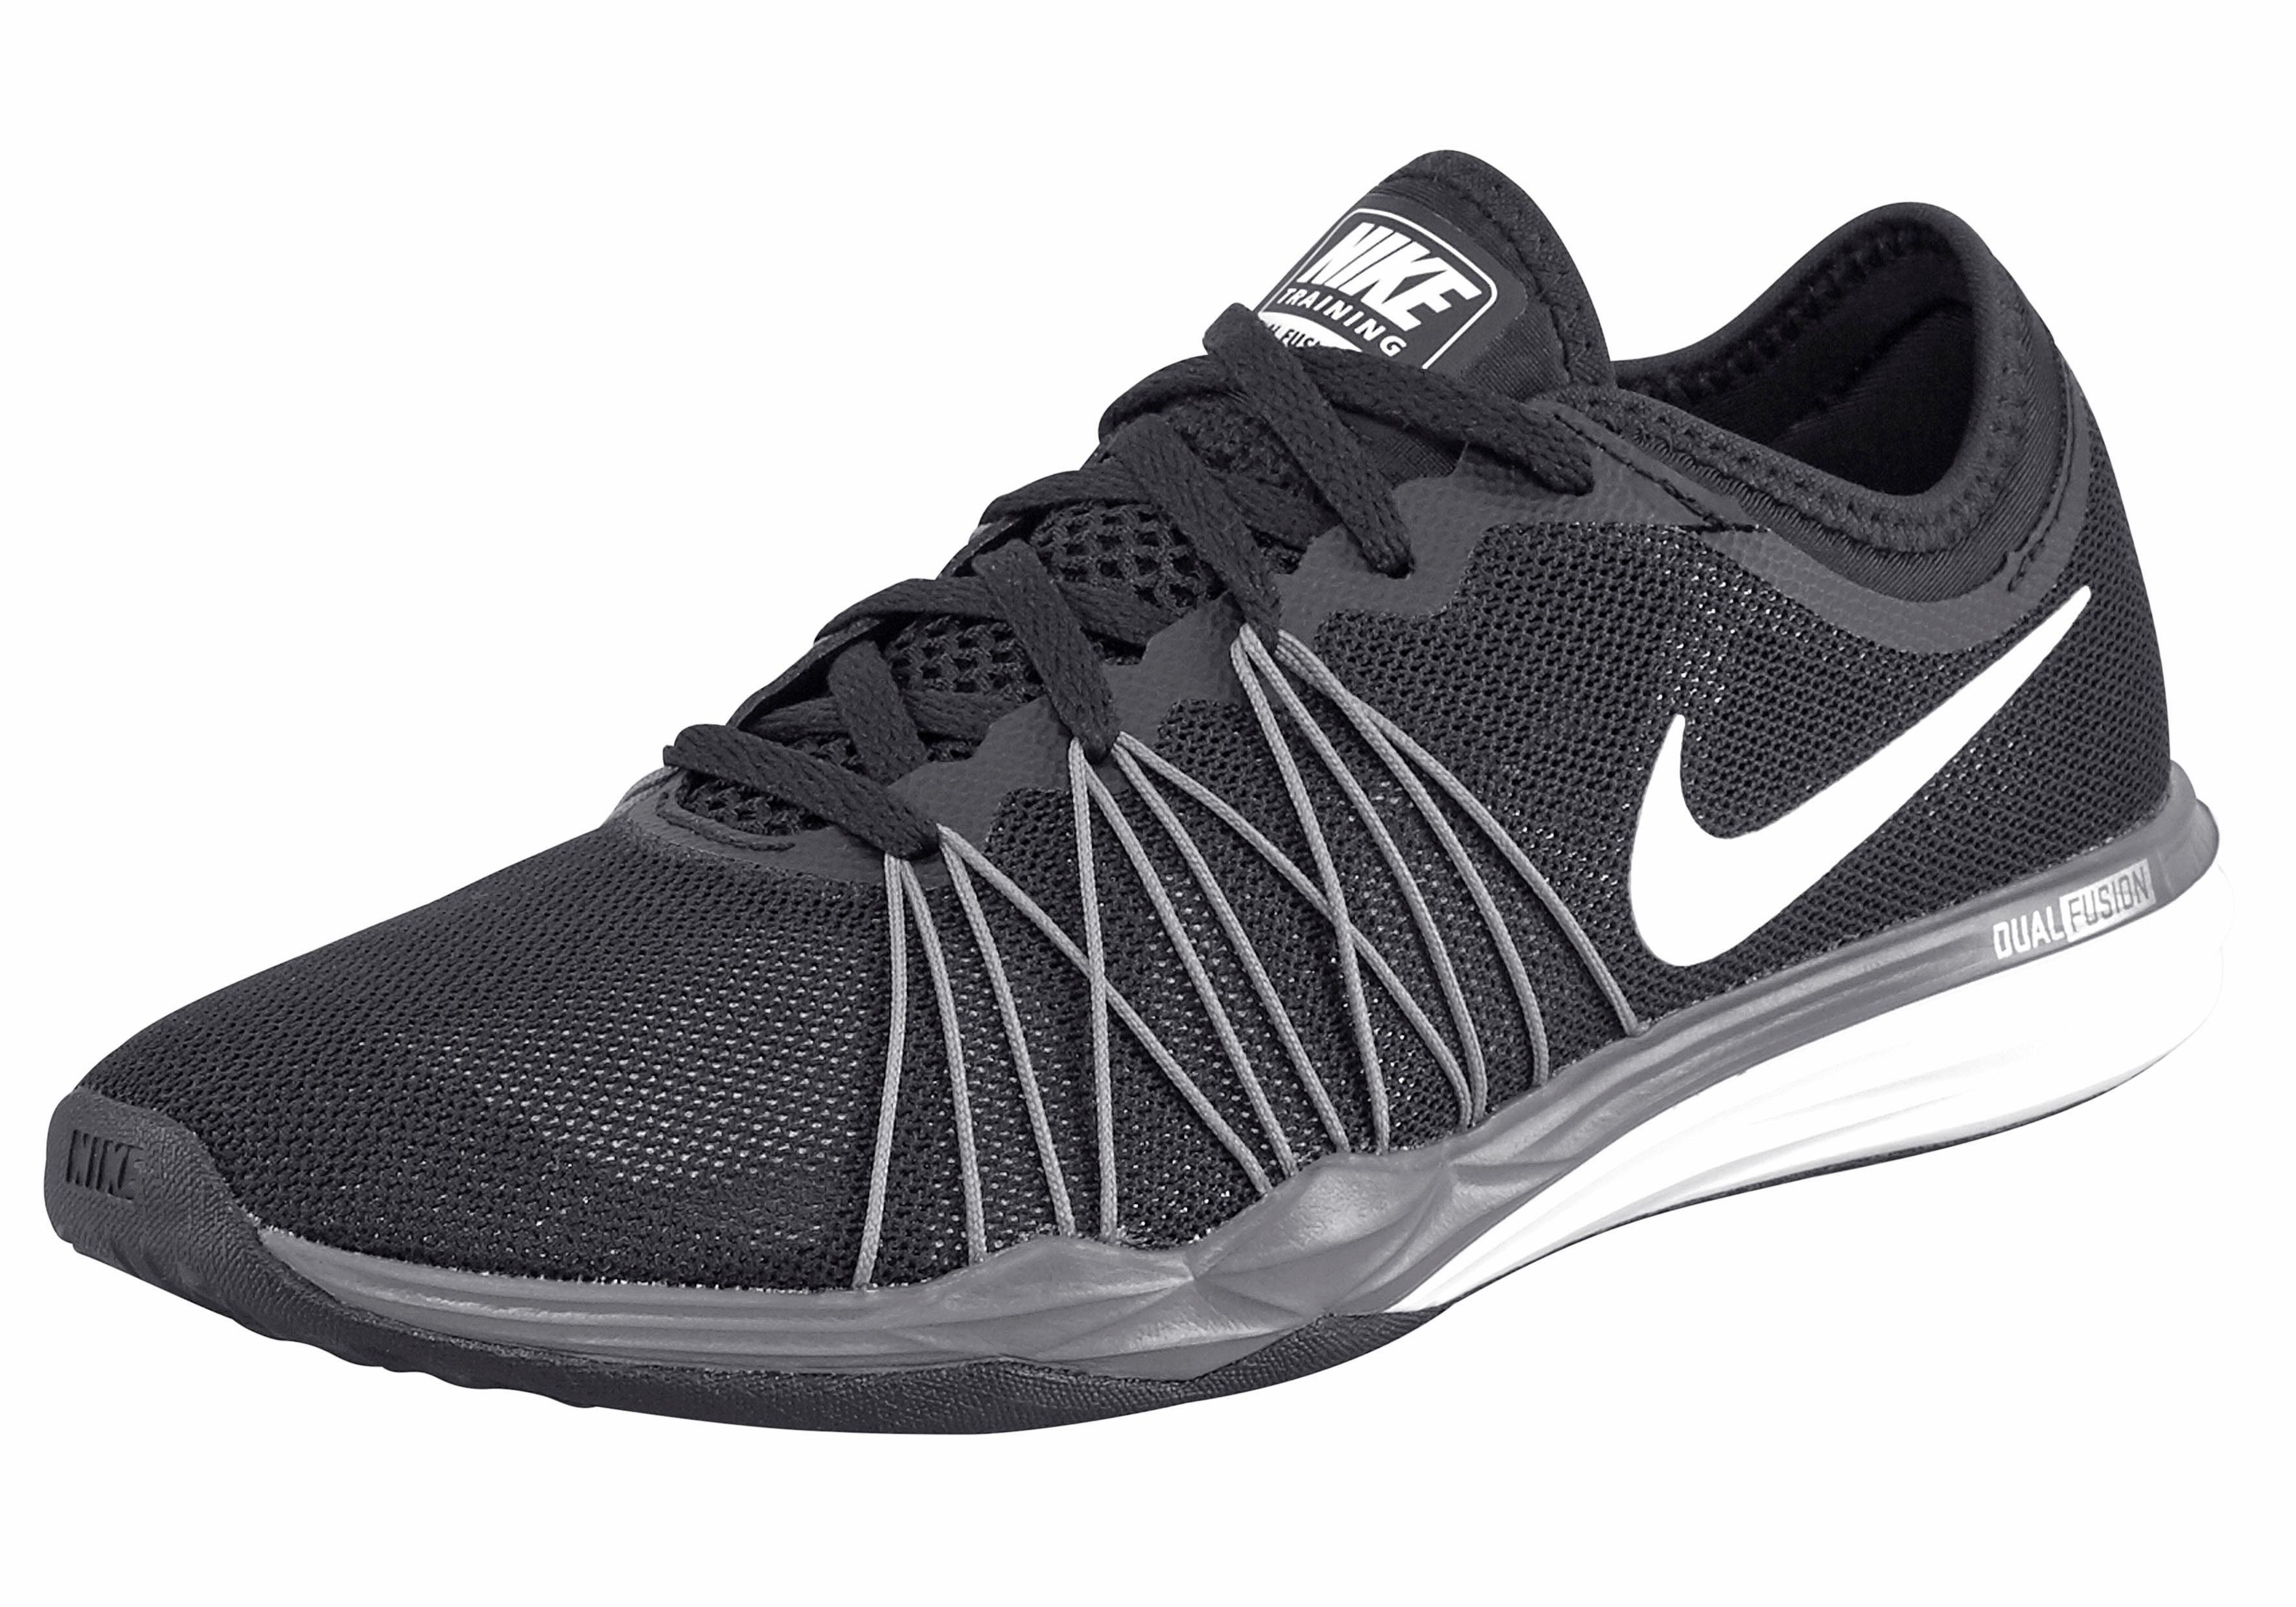 Nike - Dual Fusion Tr Succès Chaussures De Fitness - Femmes - Chaussures De Fitness - Noir - 37.5 5Gko3